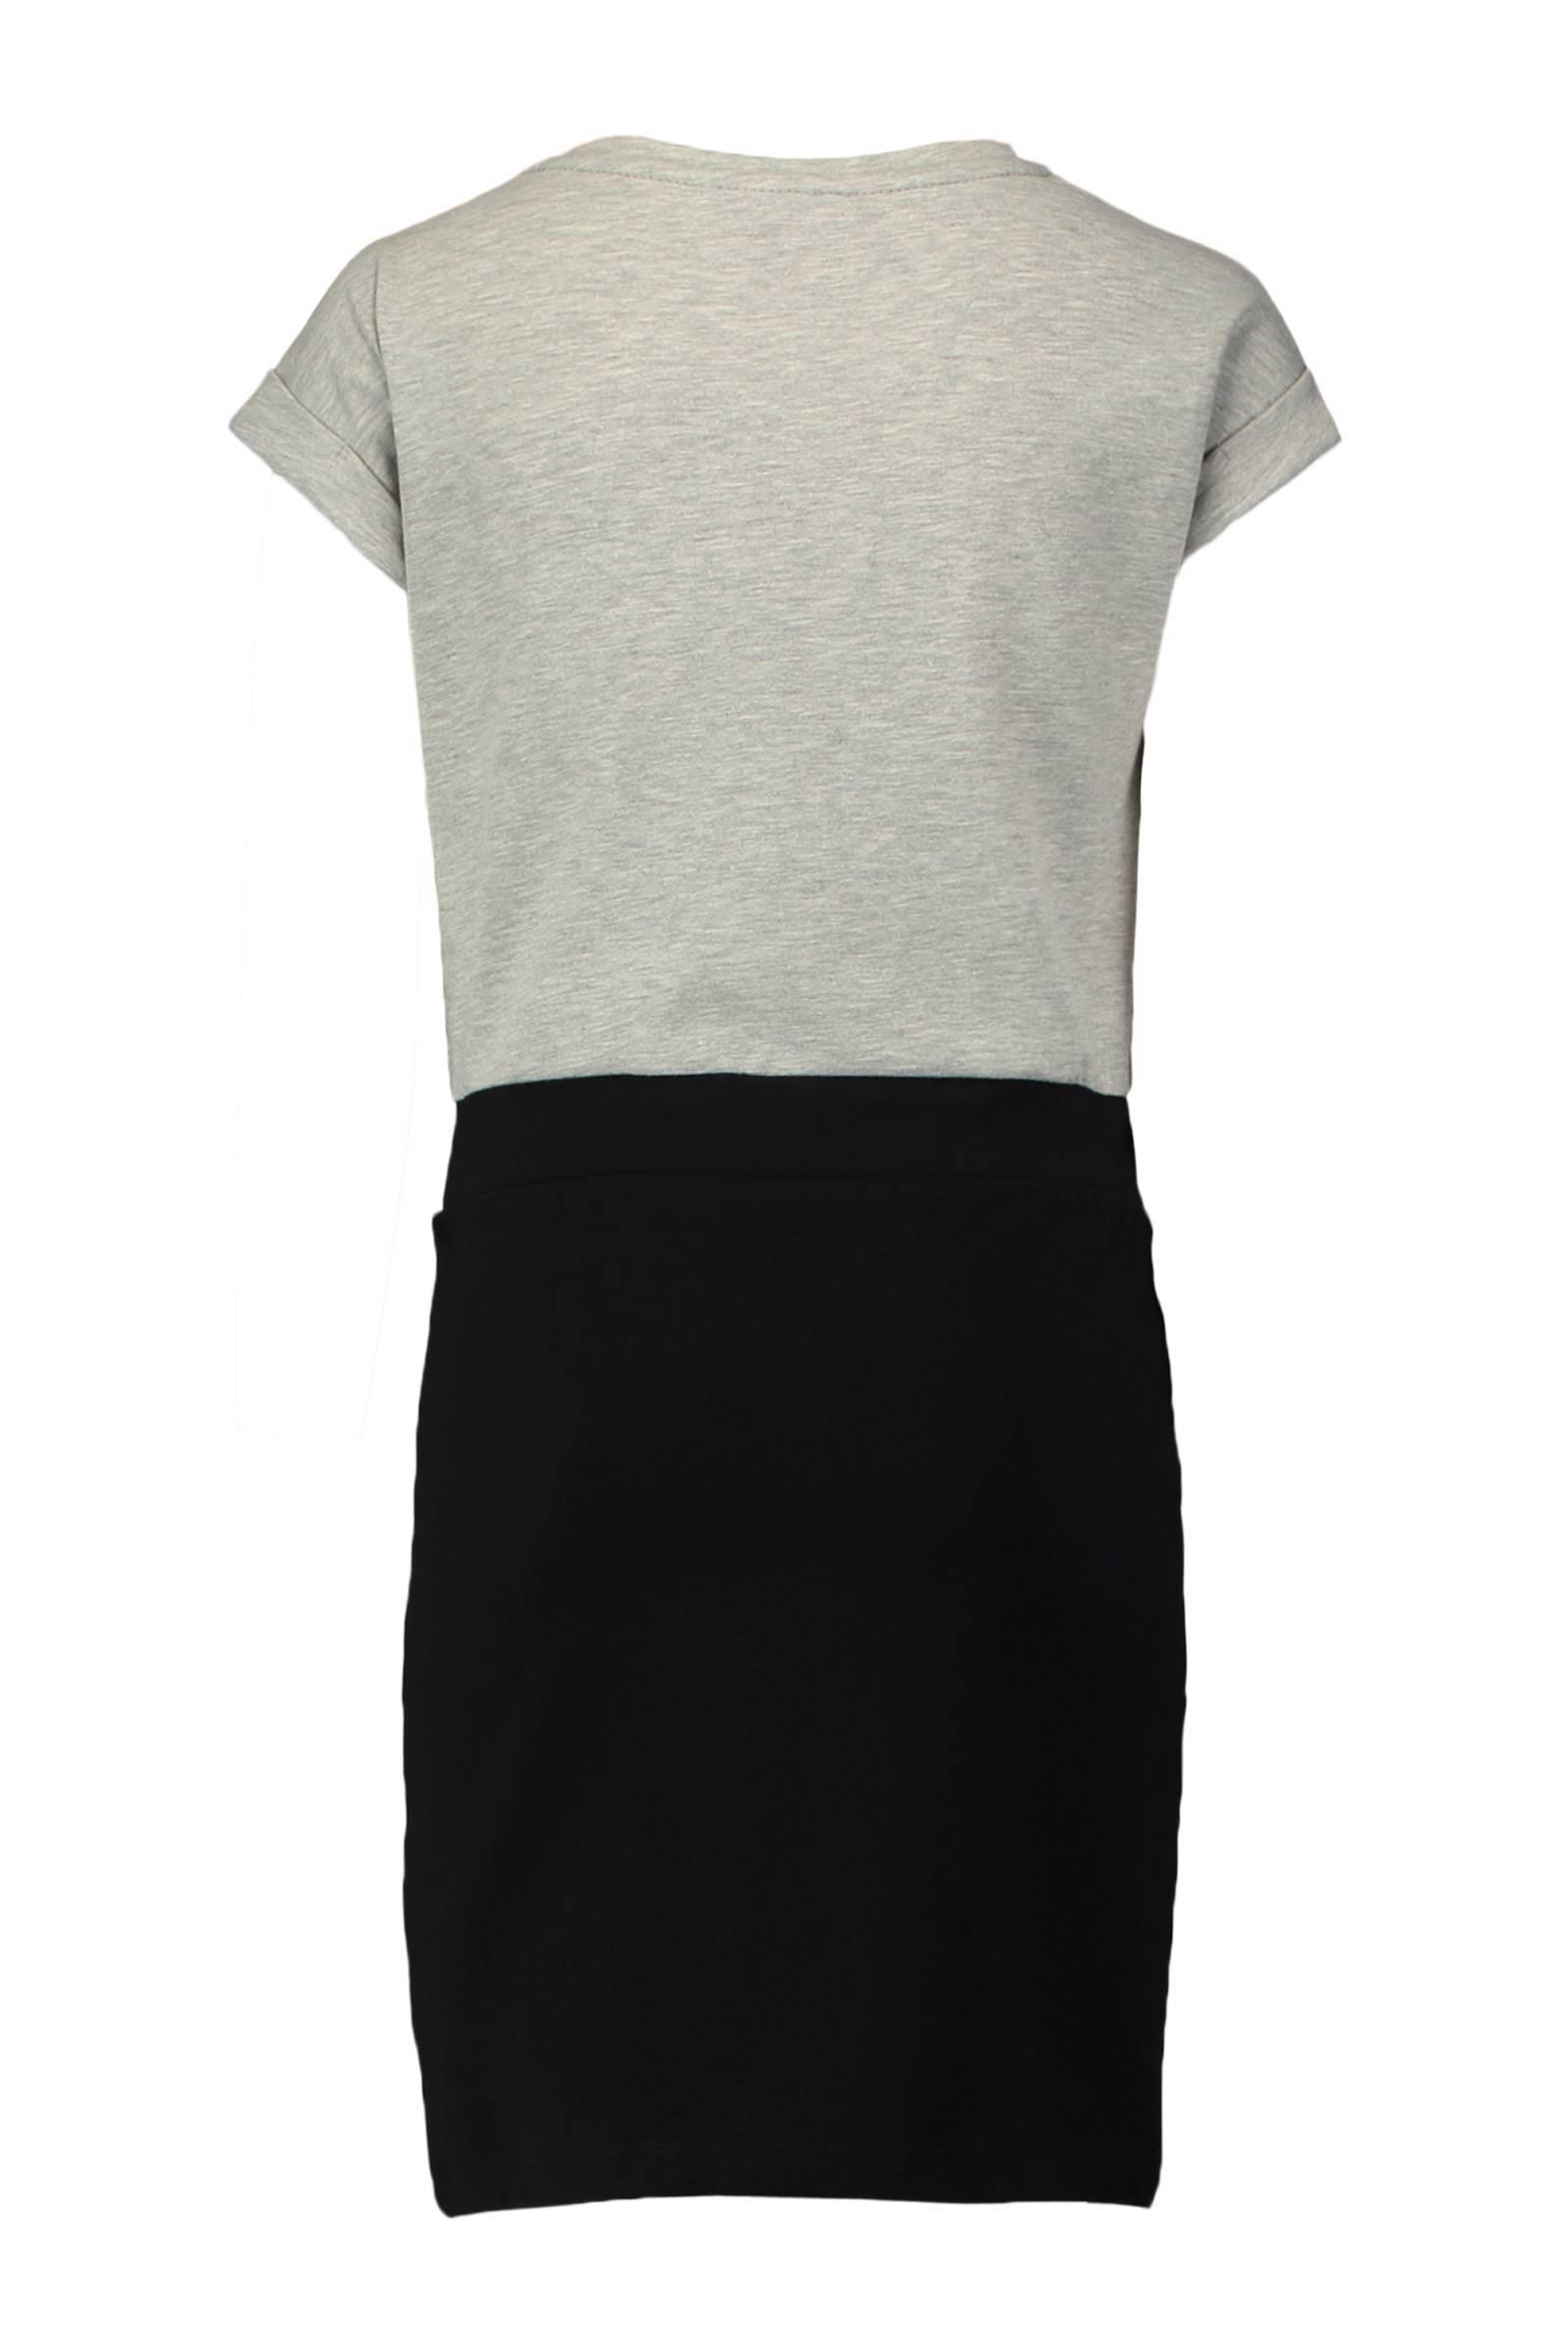 c623be8355e897 CoolCat nset jurk